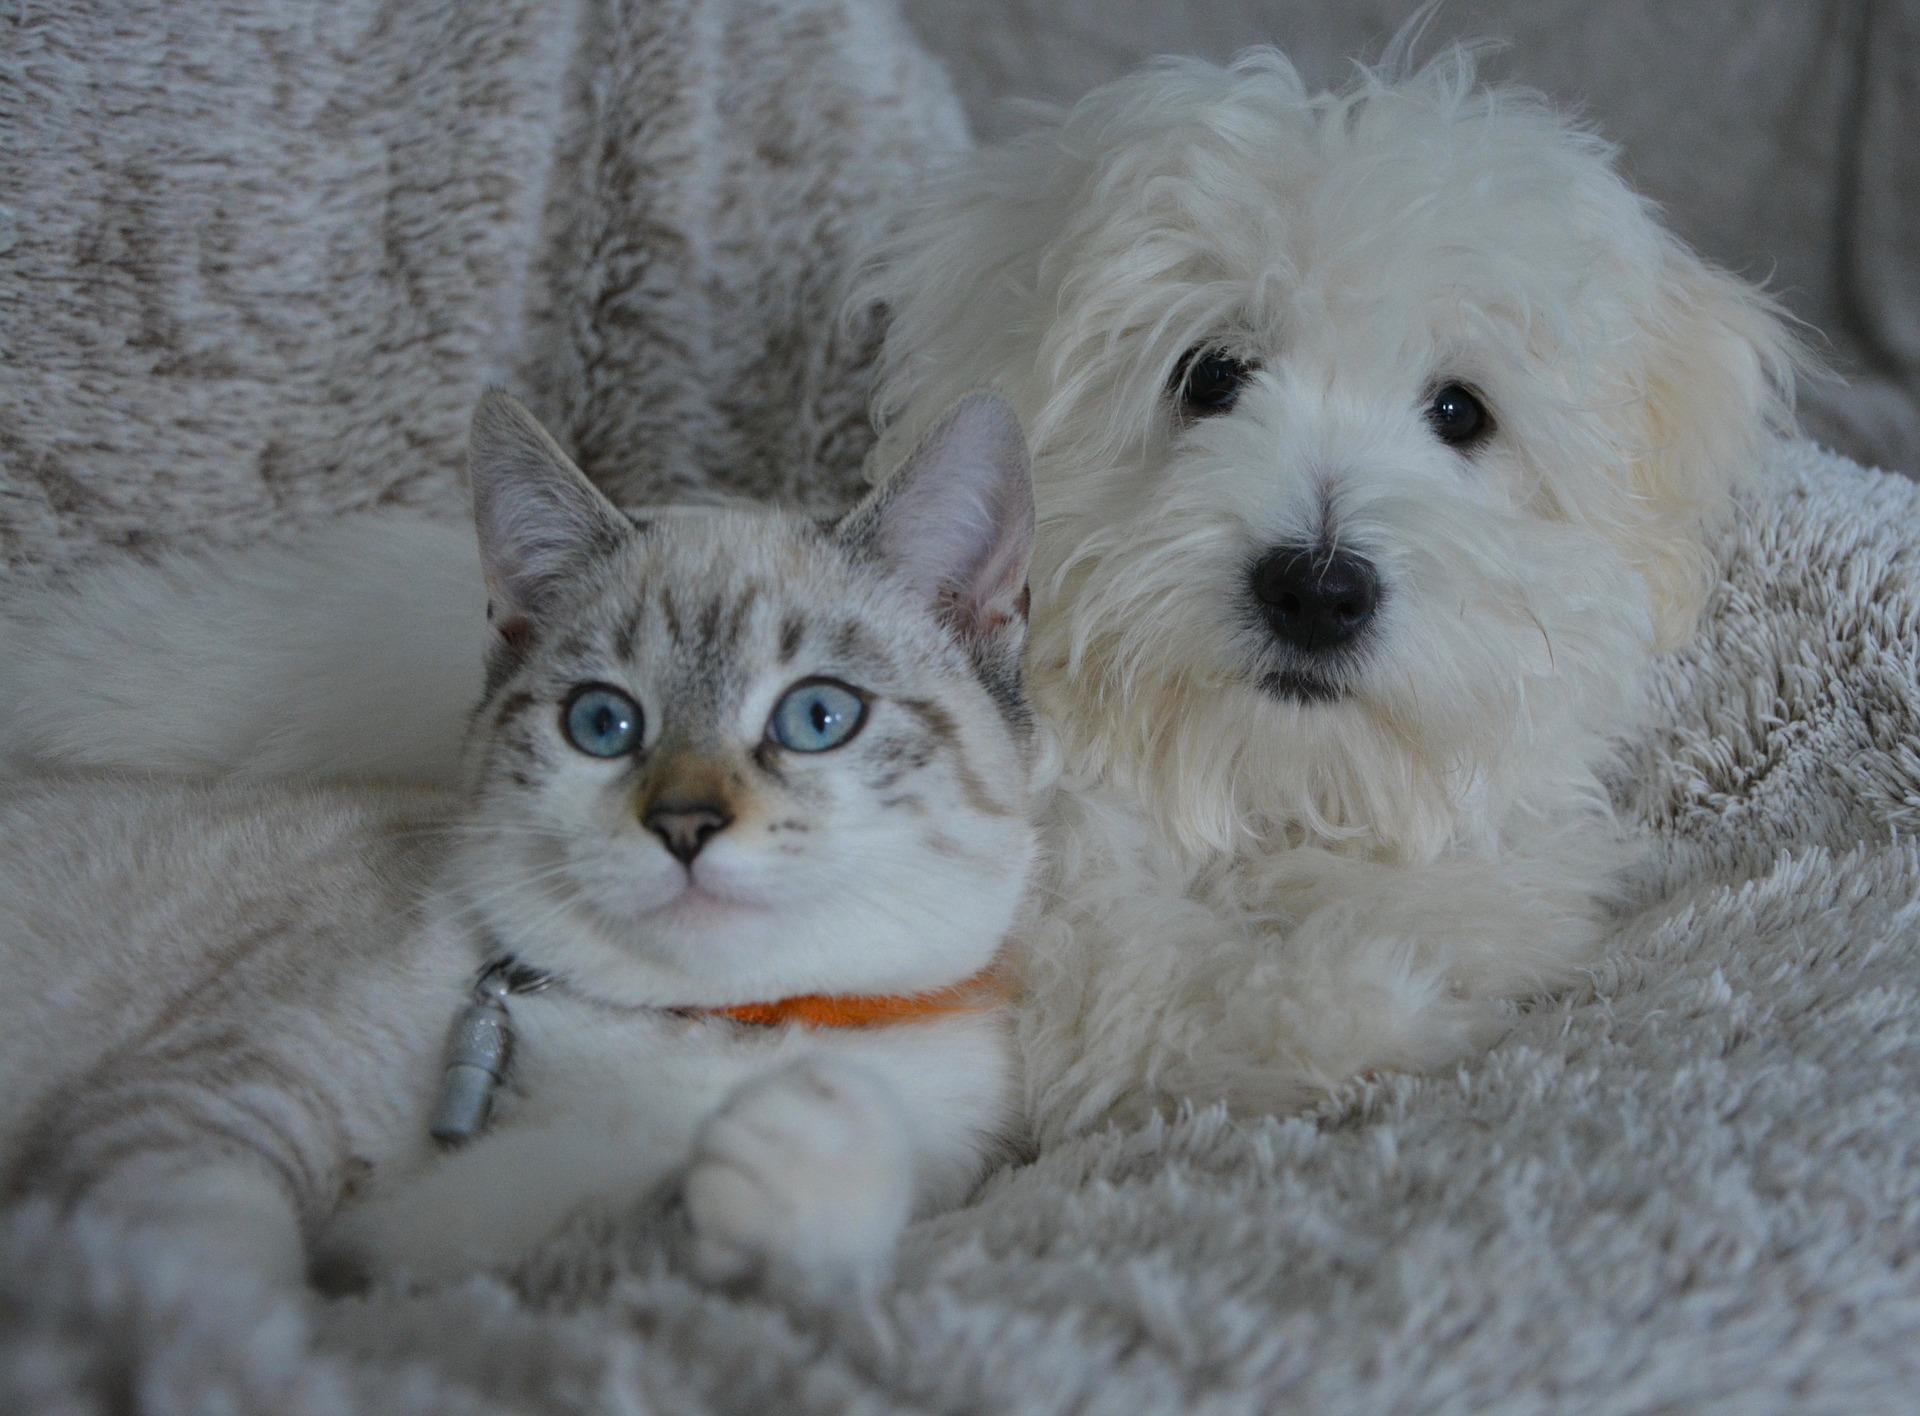 Pet Custody Coming to Illinois in 2018